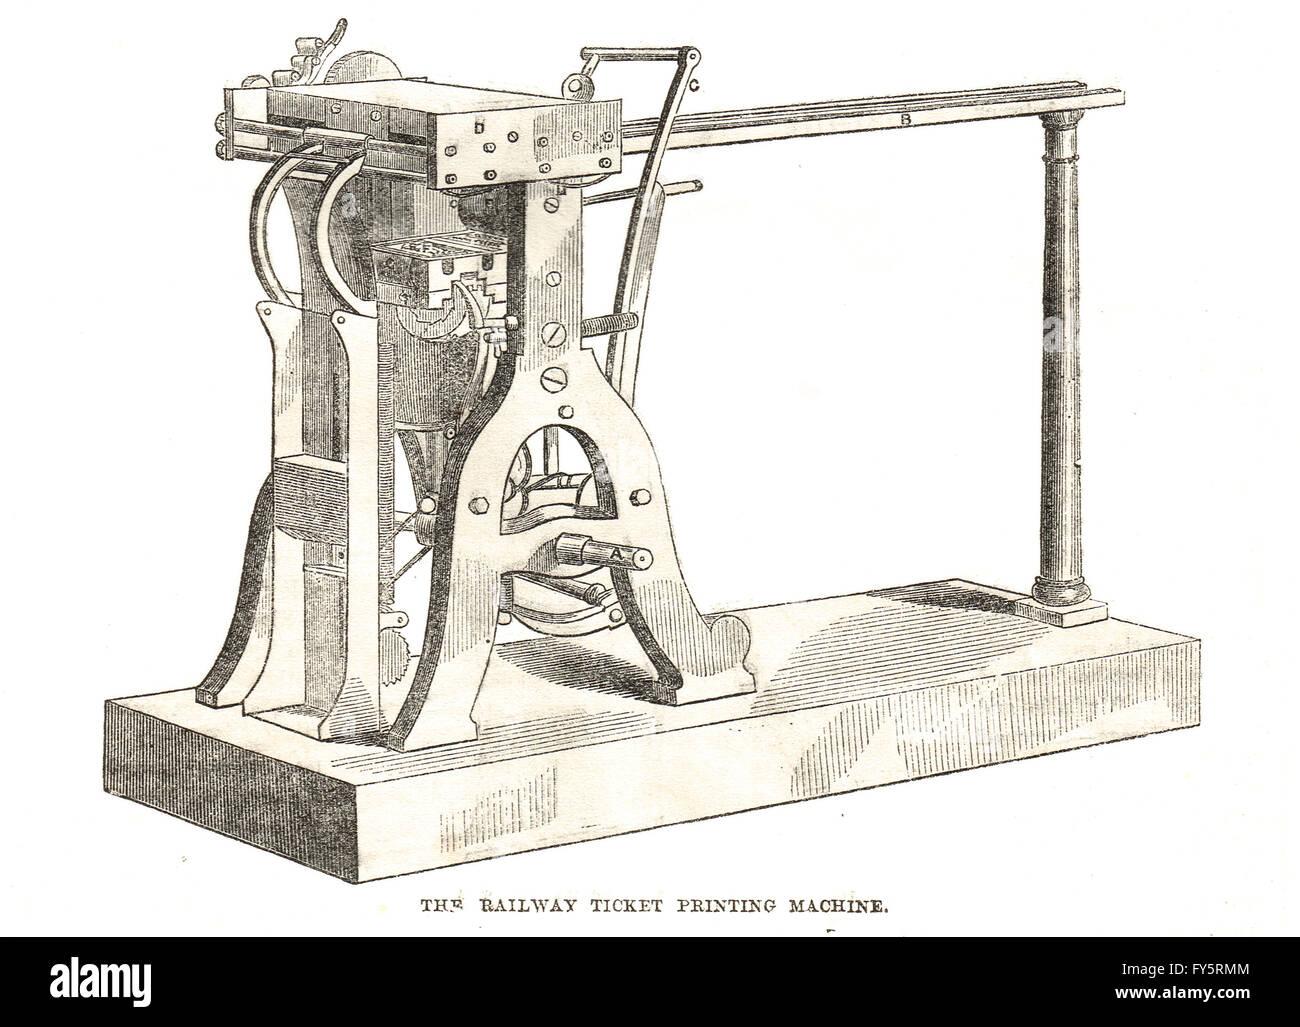 railway ticket printing machine the great exhibition of stock railway ticket printing machine the great exhibition of 1851